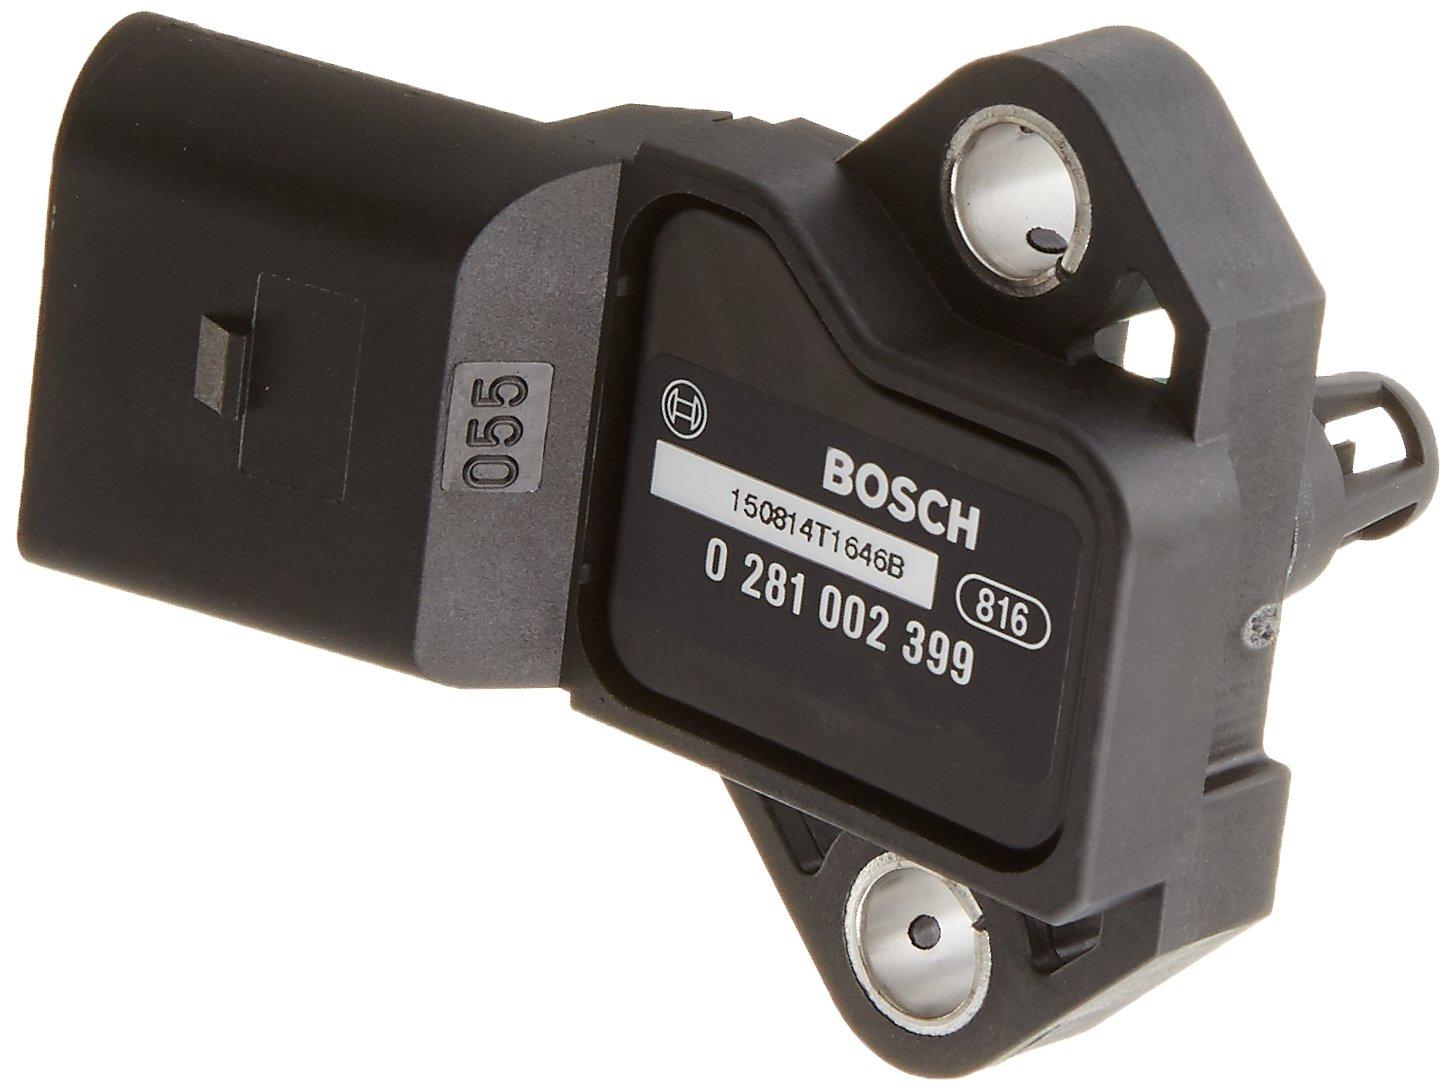 Bosch Original Equipment 0281002399 Manifold Absolute Pressure Sensor (MAP)